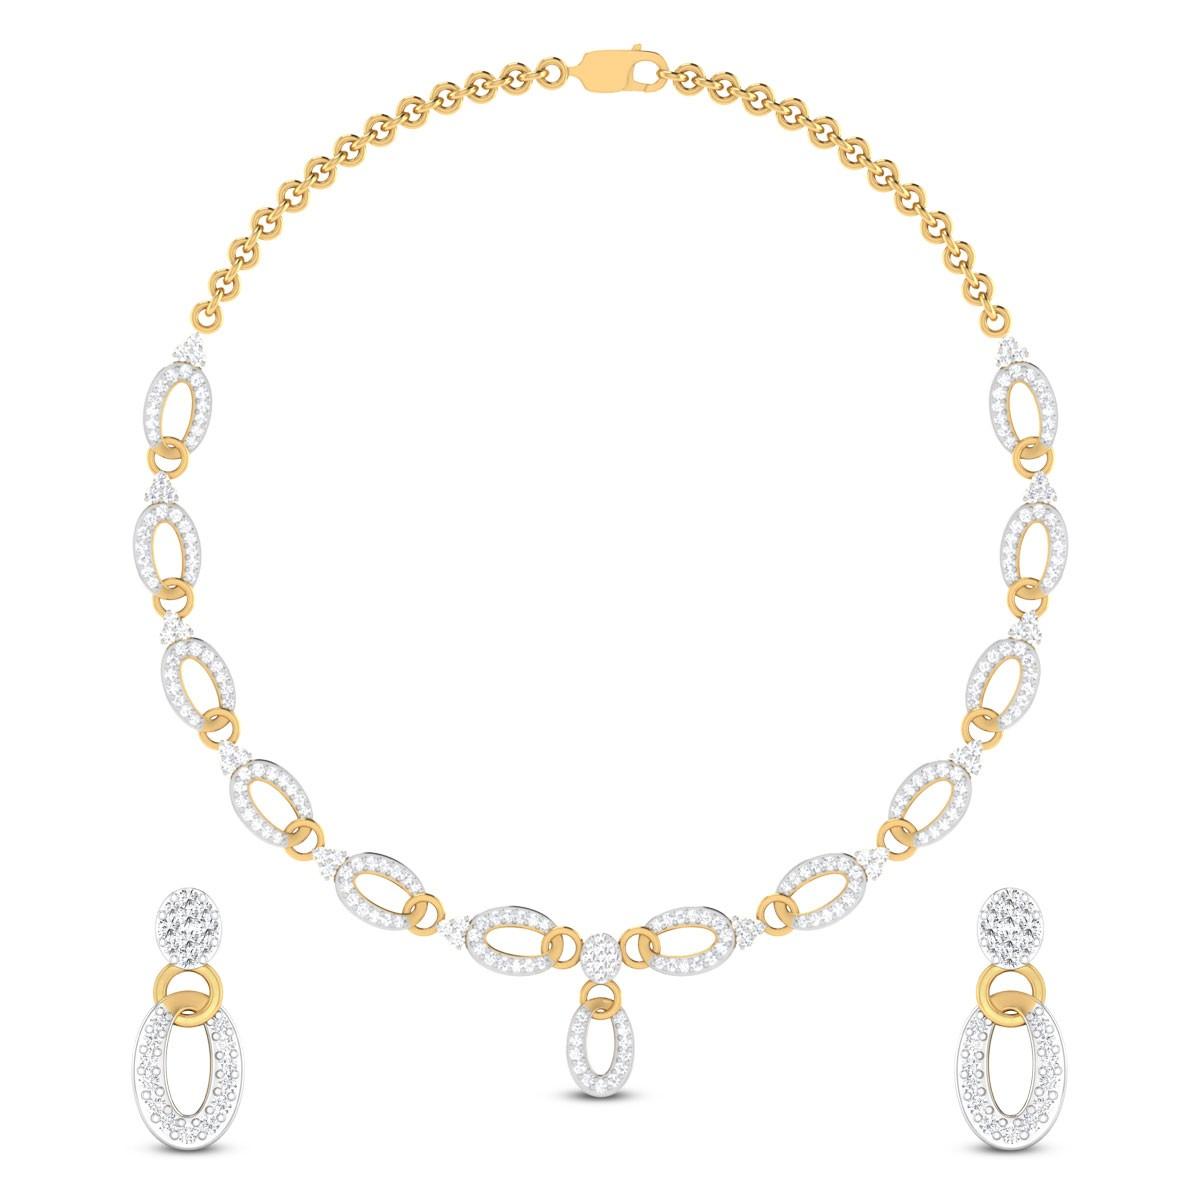 Fiorenza Diamond Necklace Set